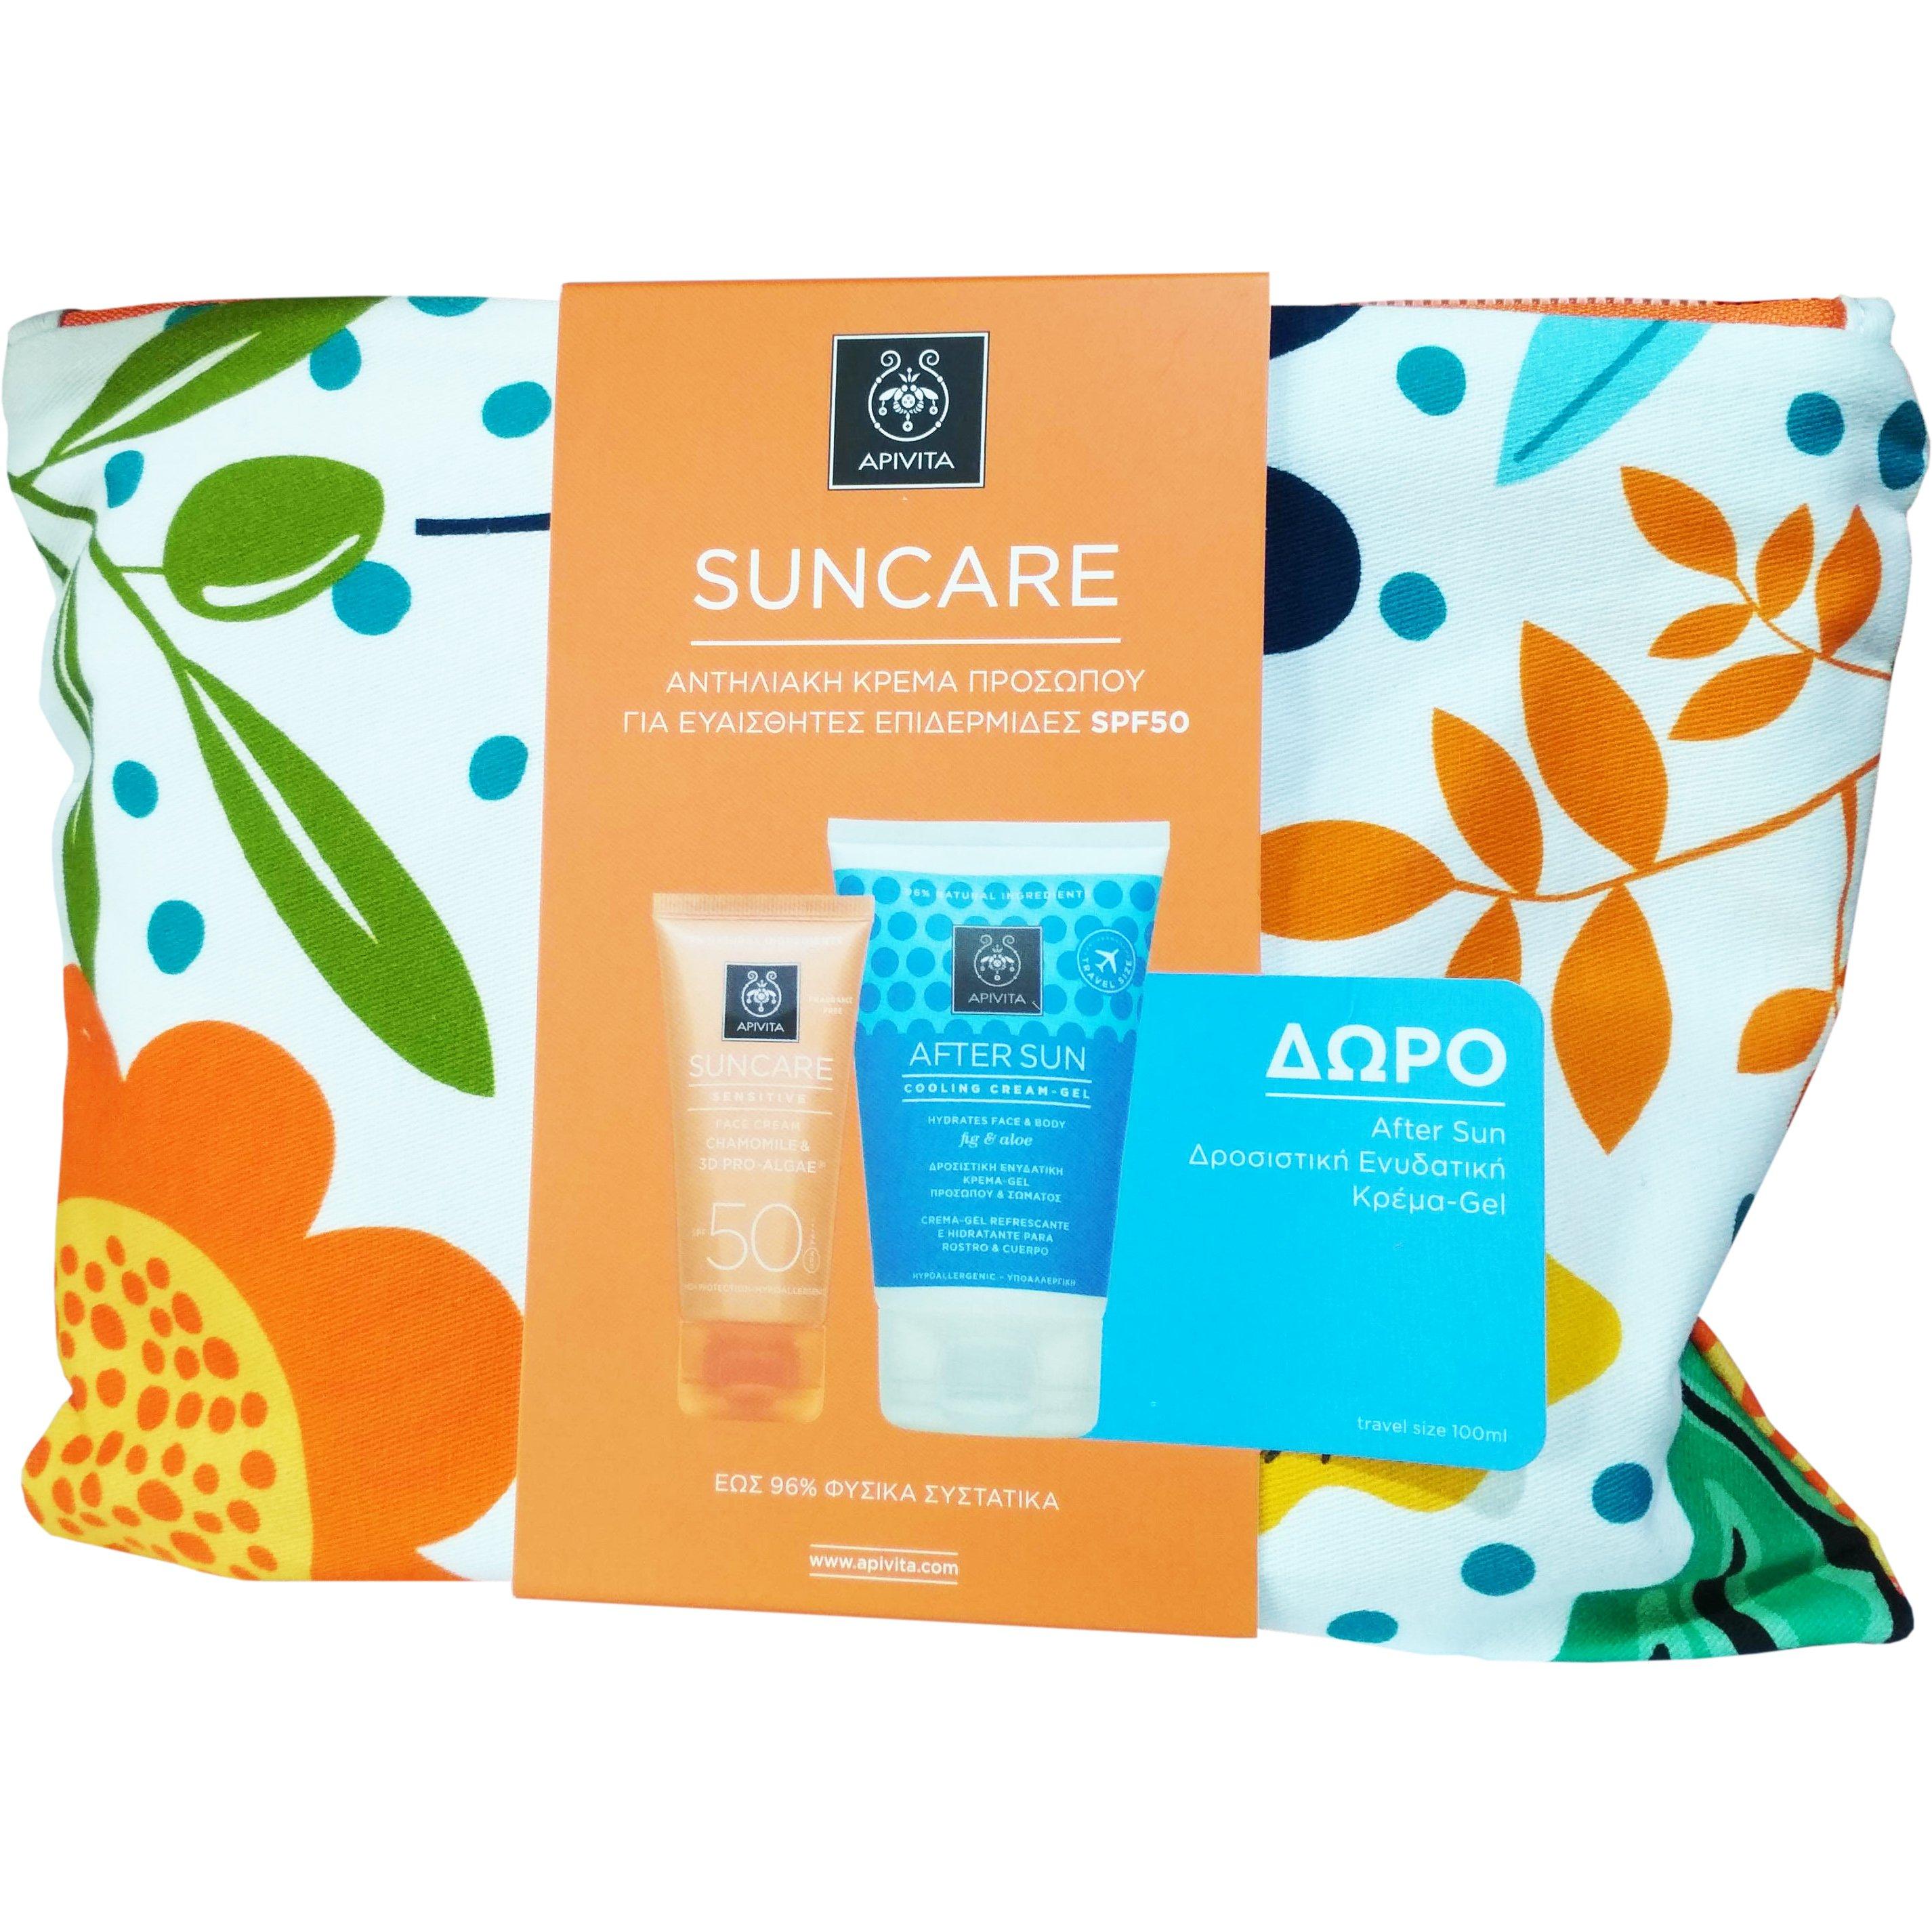 Apivita Πακέτο Προσφοράς Suncare Sensitive Face Cream Spf50, 50ml & Δώρο After S αντηλιακά   αντηλιακά προσώπου   αντηλιακά προστασία για ευαίσθητες   δυσανεκτικ